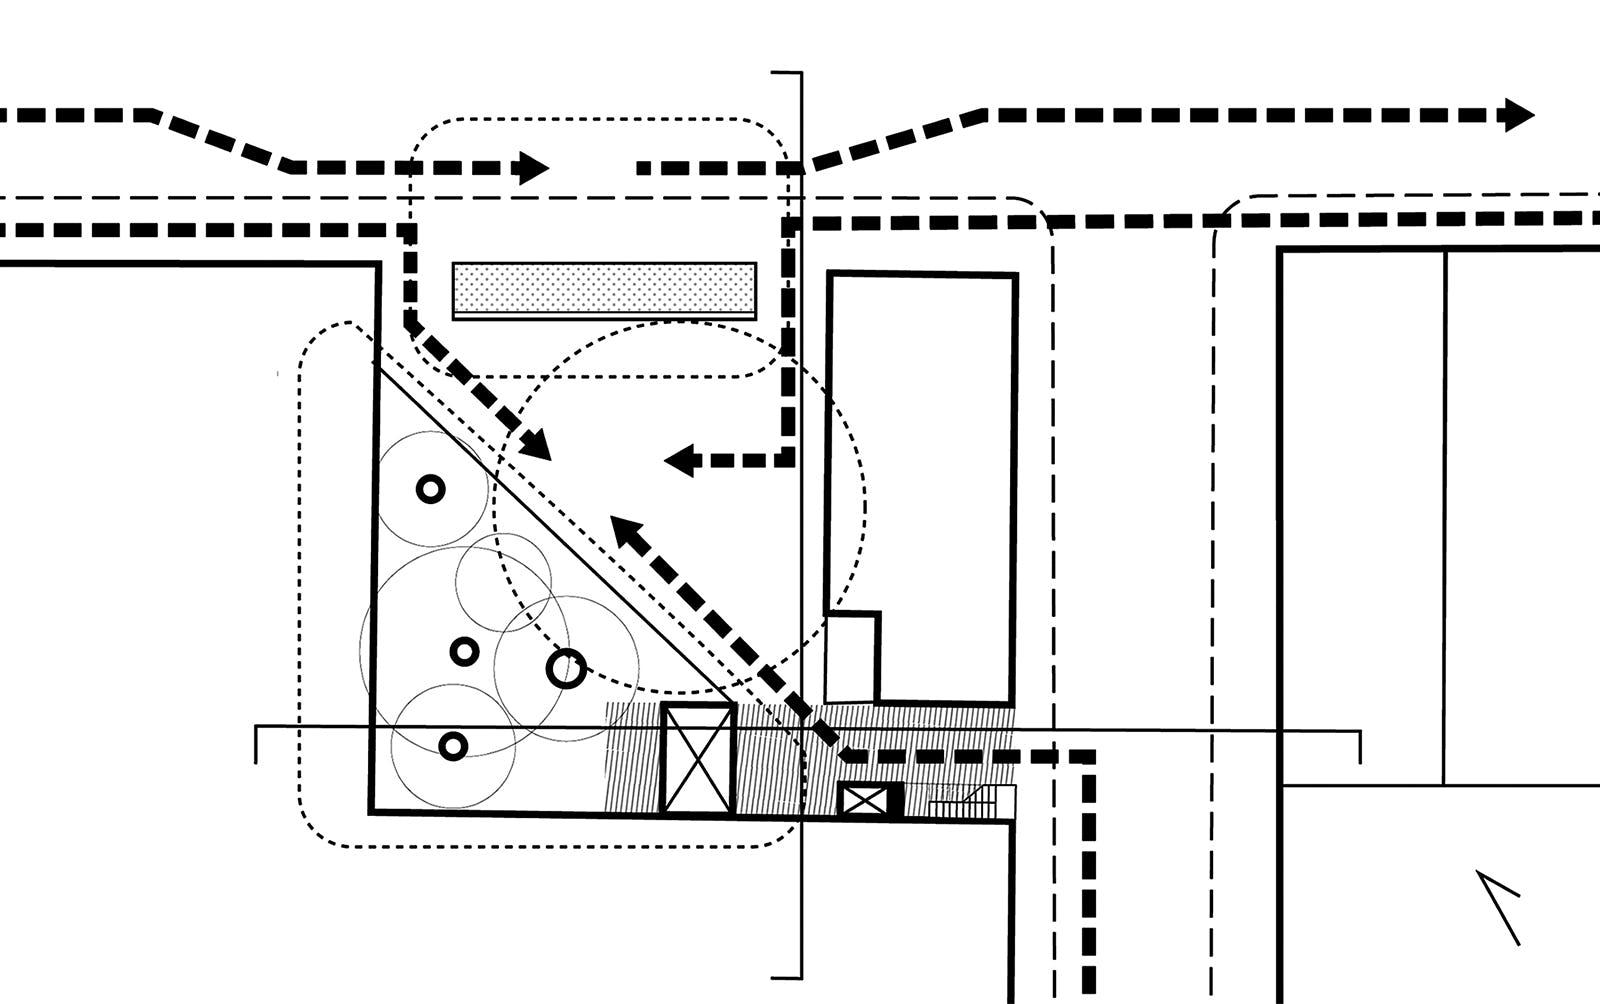 80e02757 1470 4ec1 9790 4c252b2eb0f2%2fbryanmaddock cartcity site